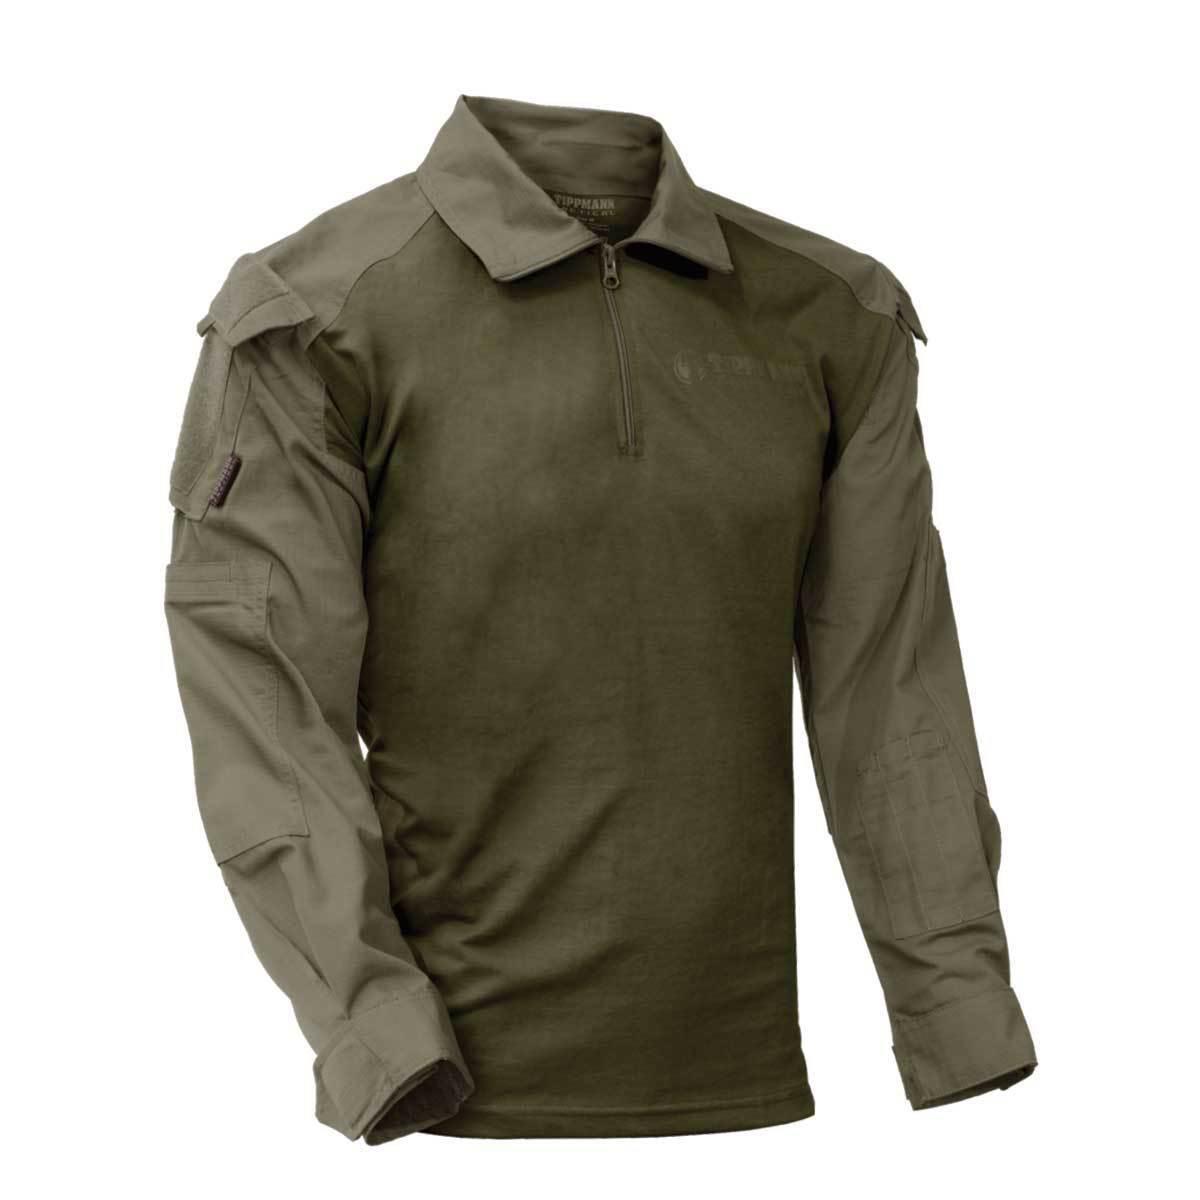 Tippmann Tactical TDU TDU TDU Shirt - Olive - Medium 6f777c